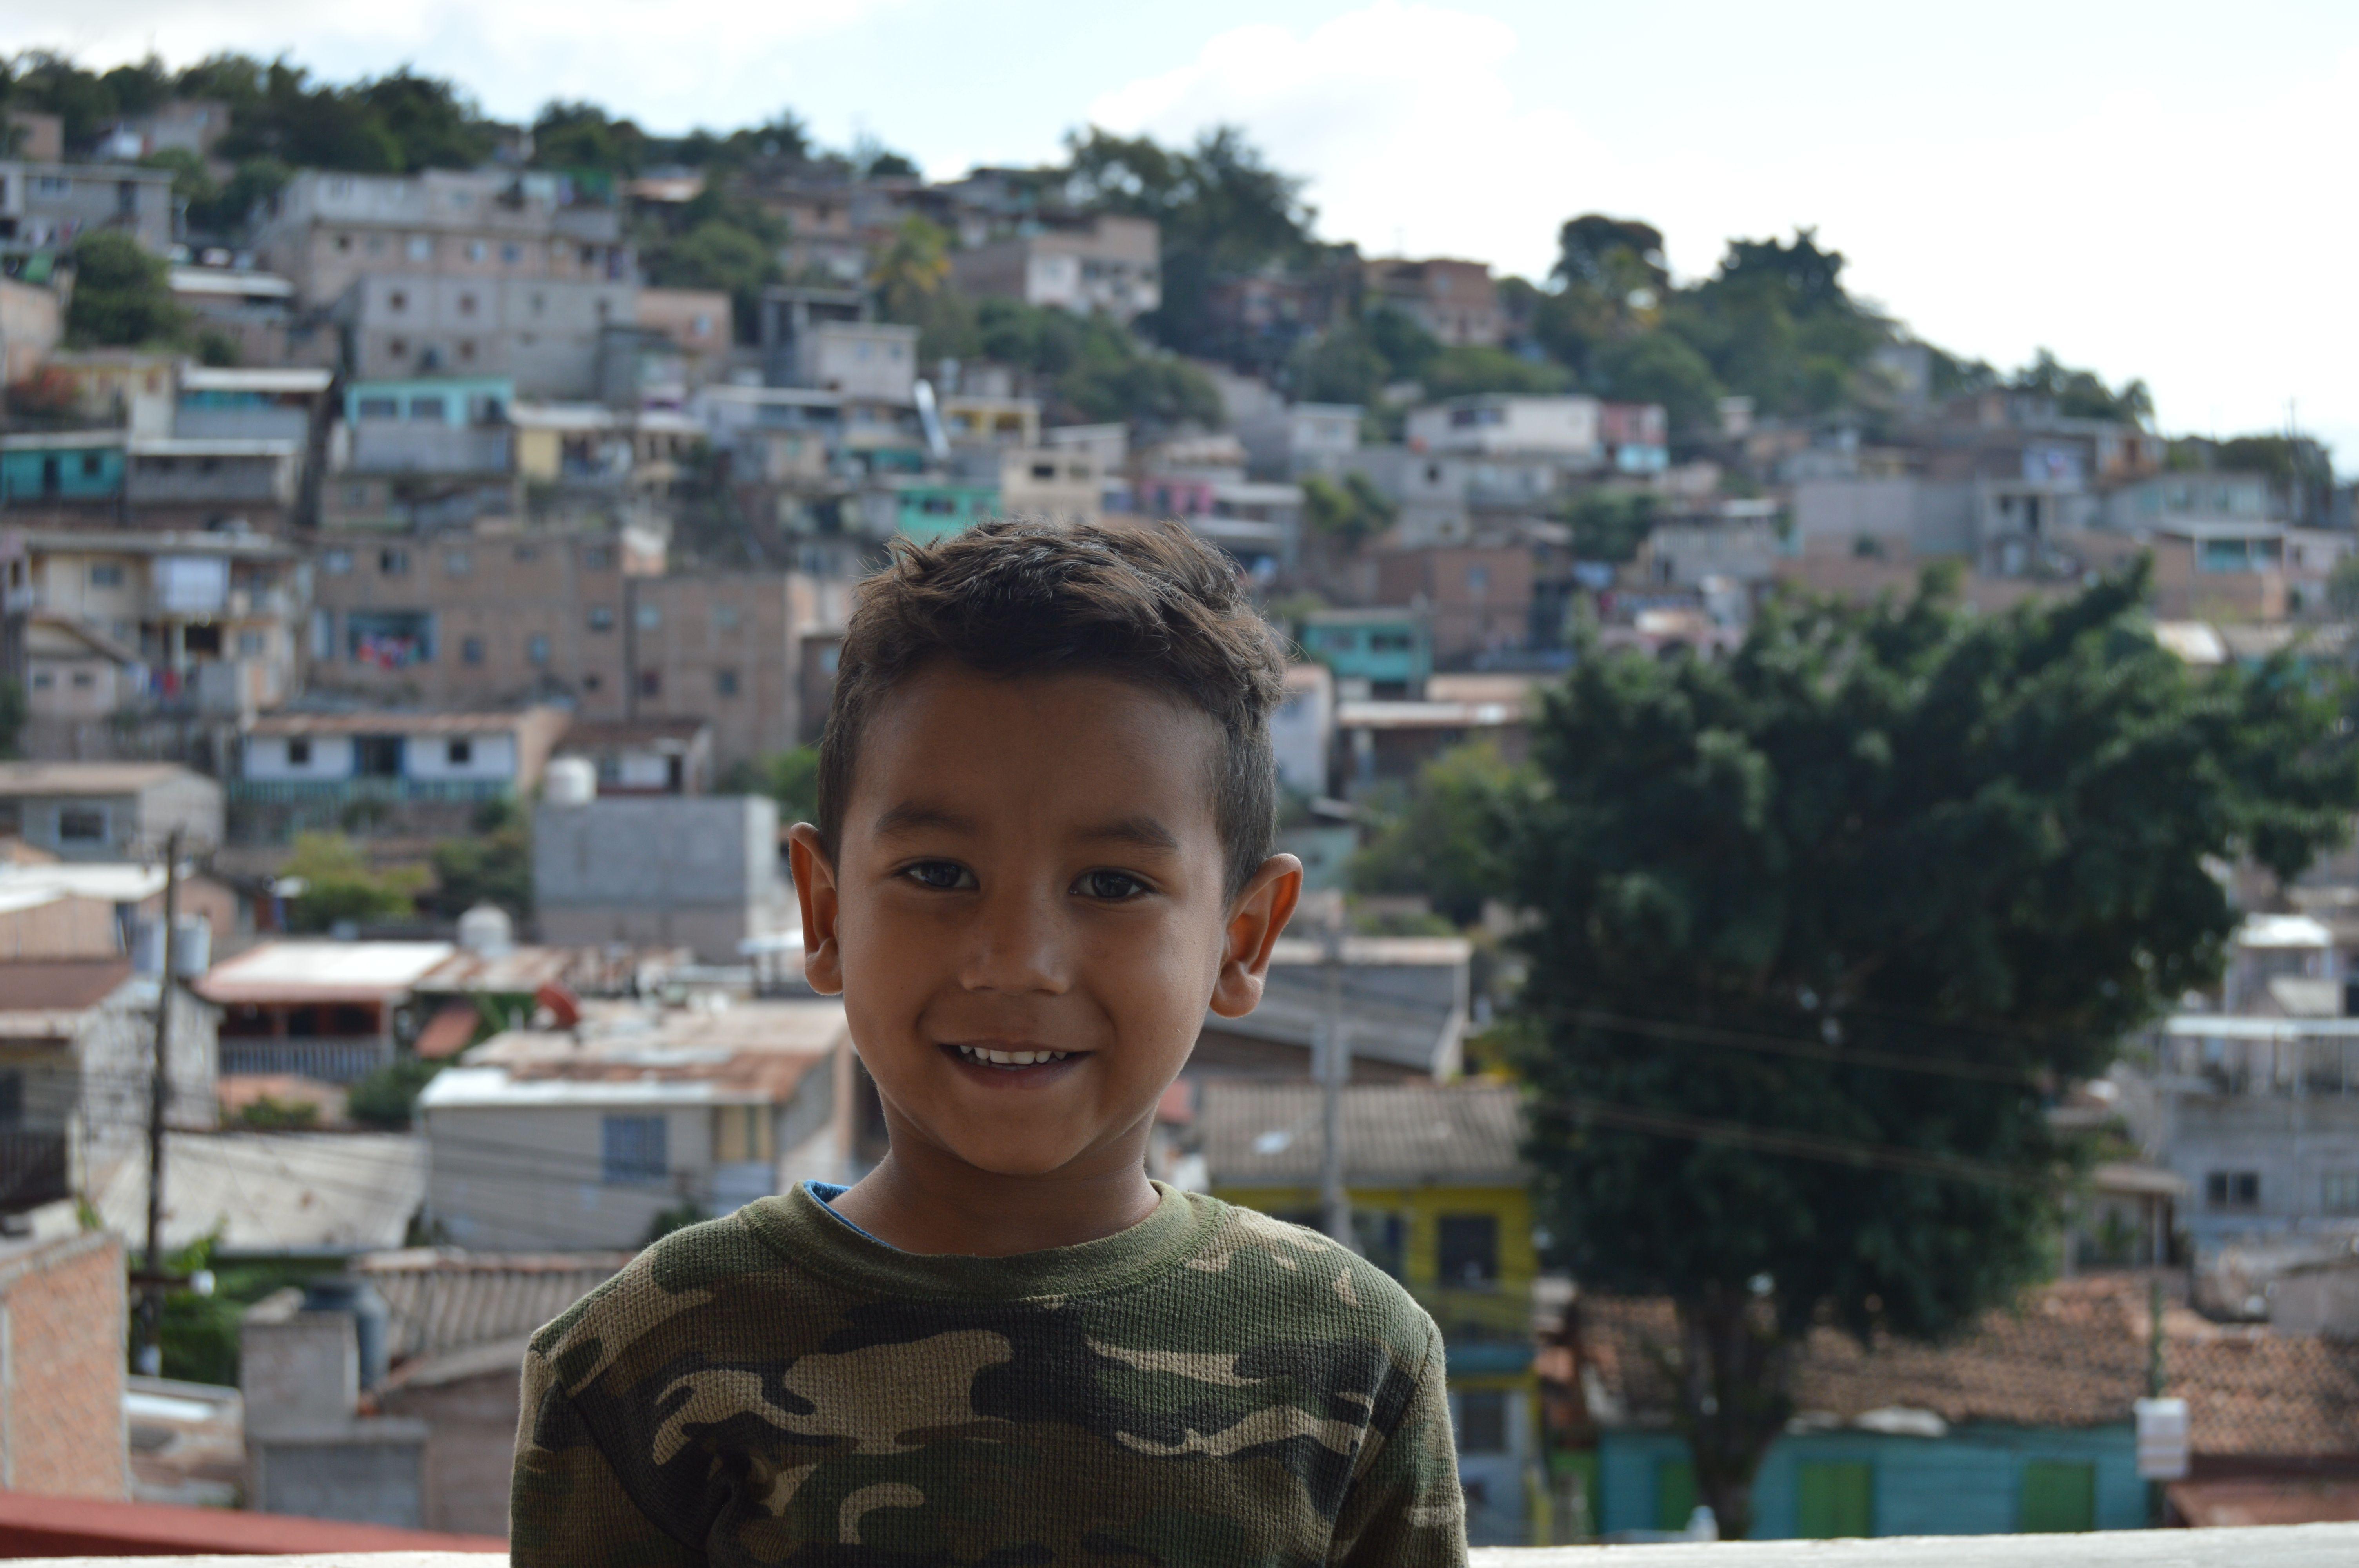 Anthony Esahu Torres Ramirez